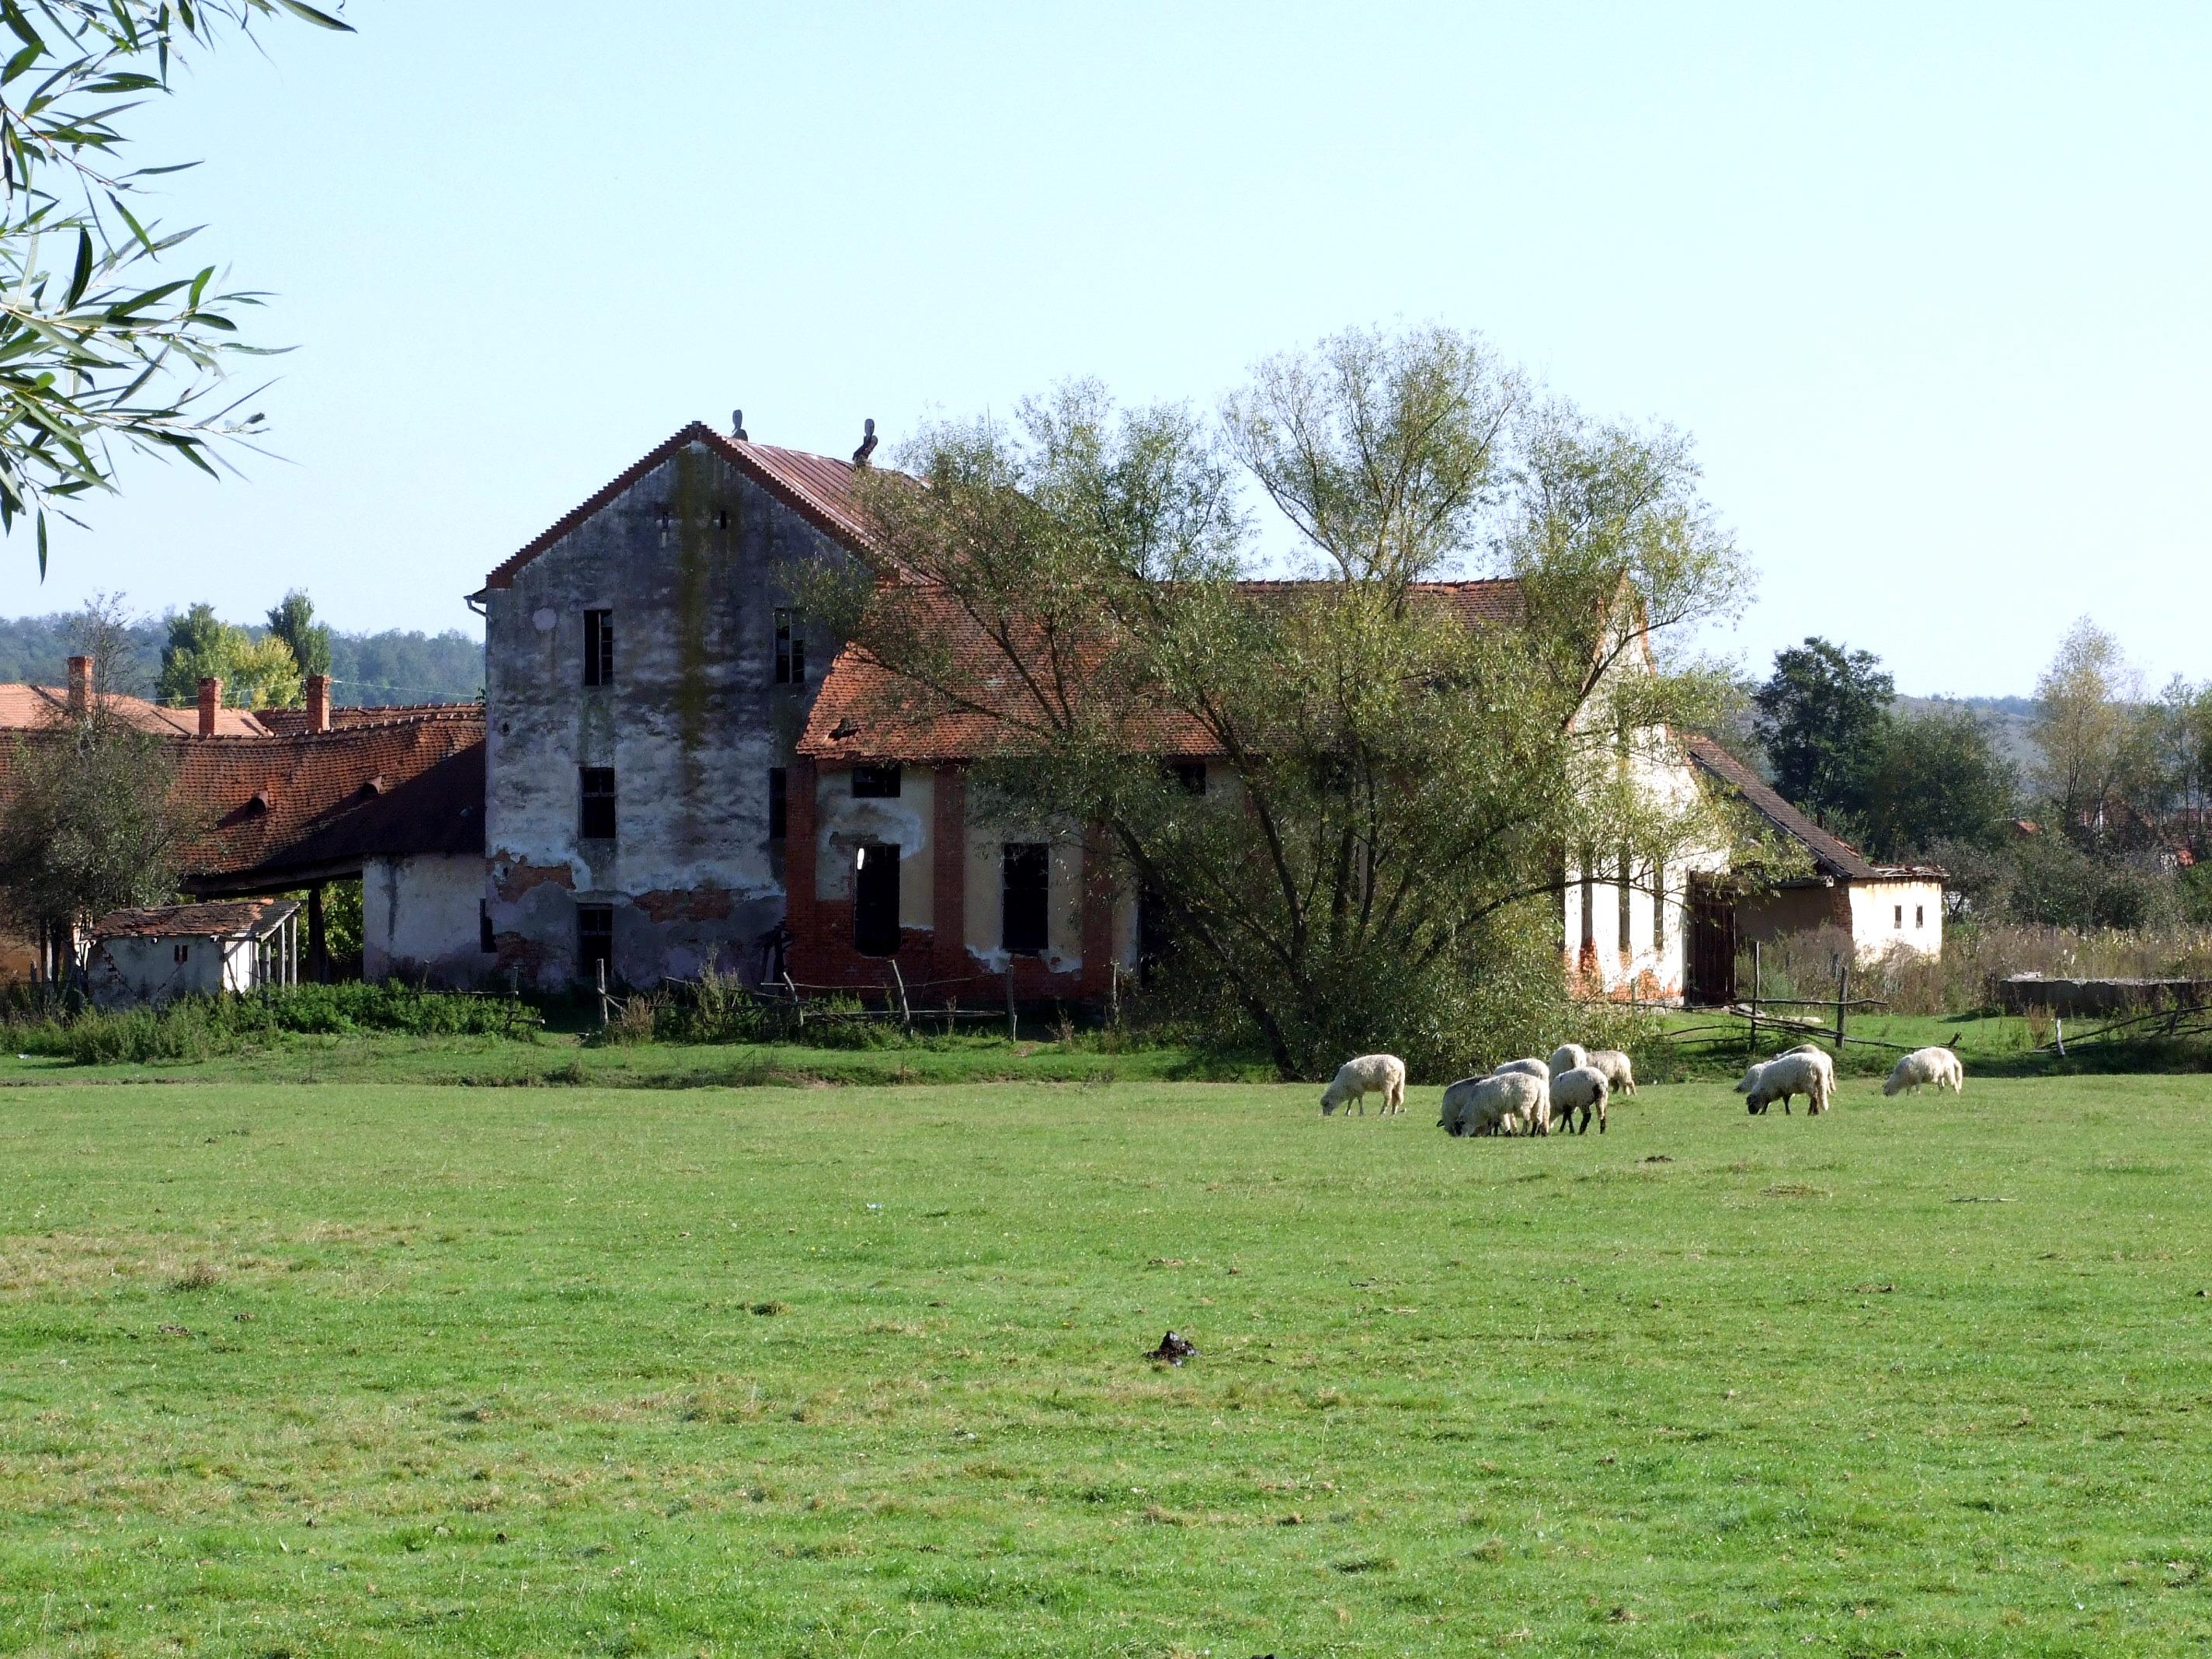 Old Farmhouse   Best Landscape Wallpapers 2848x2136